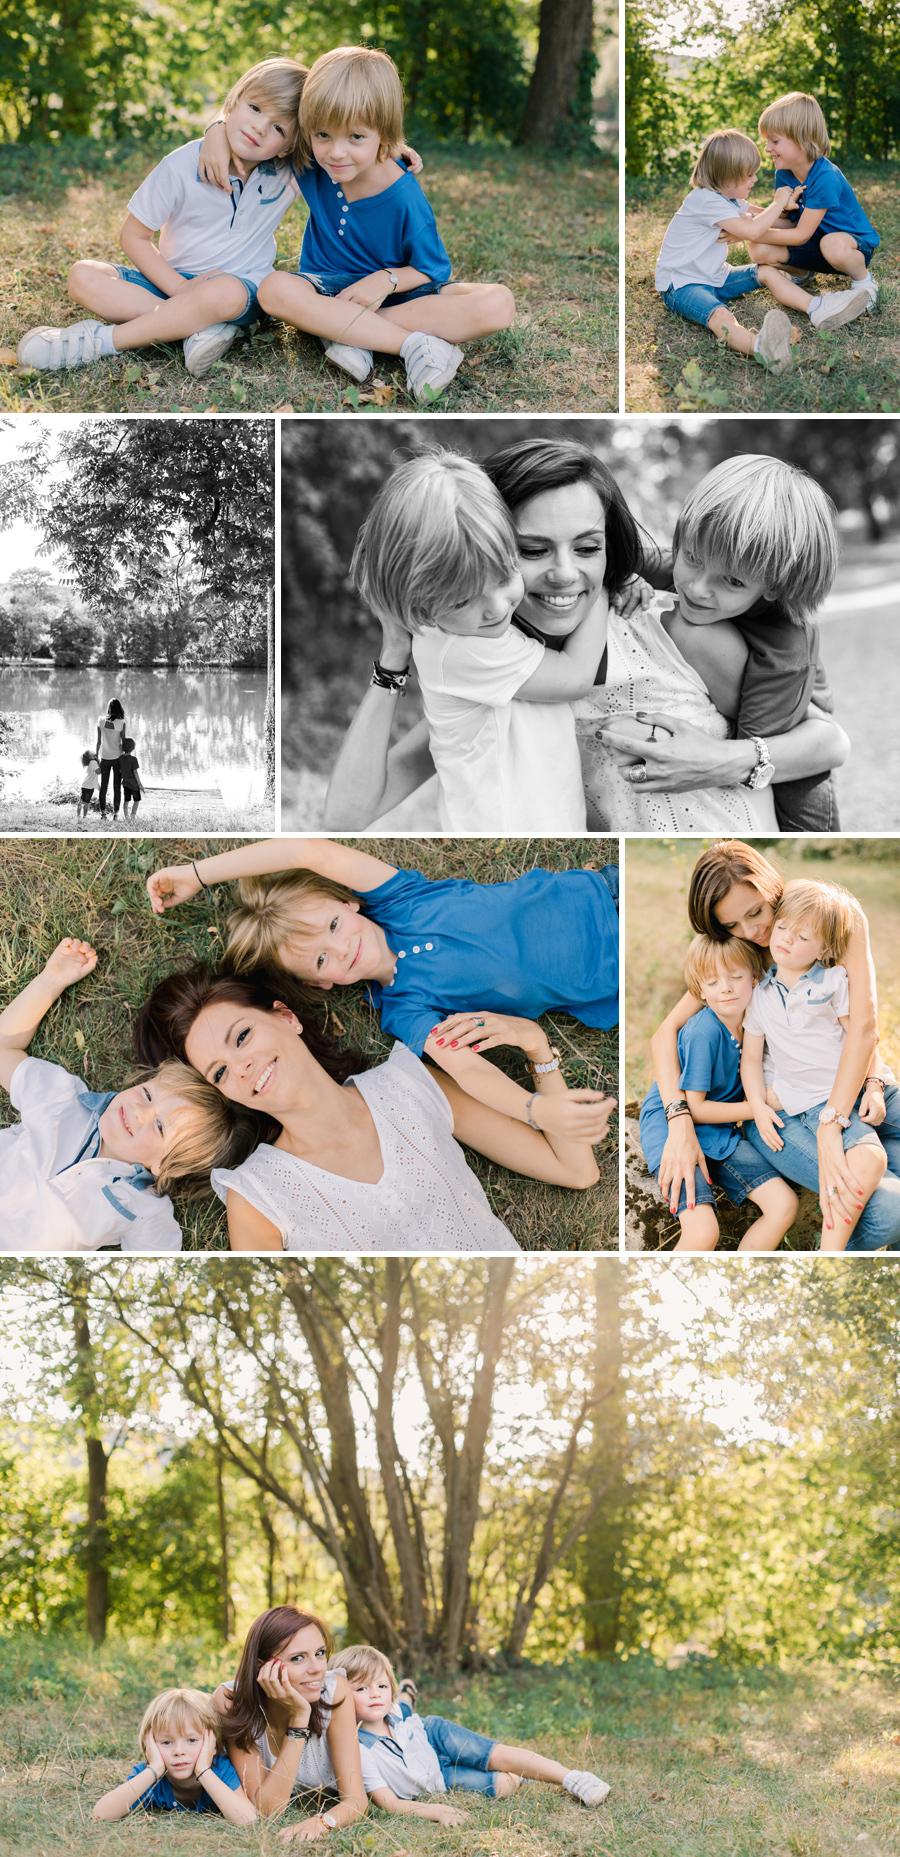 séance photo photographe famille metz luxembourg